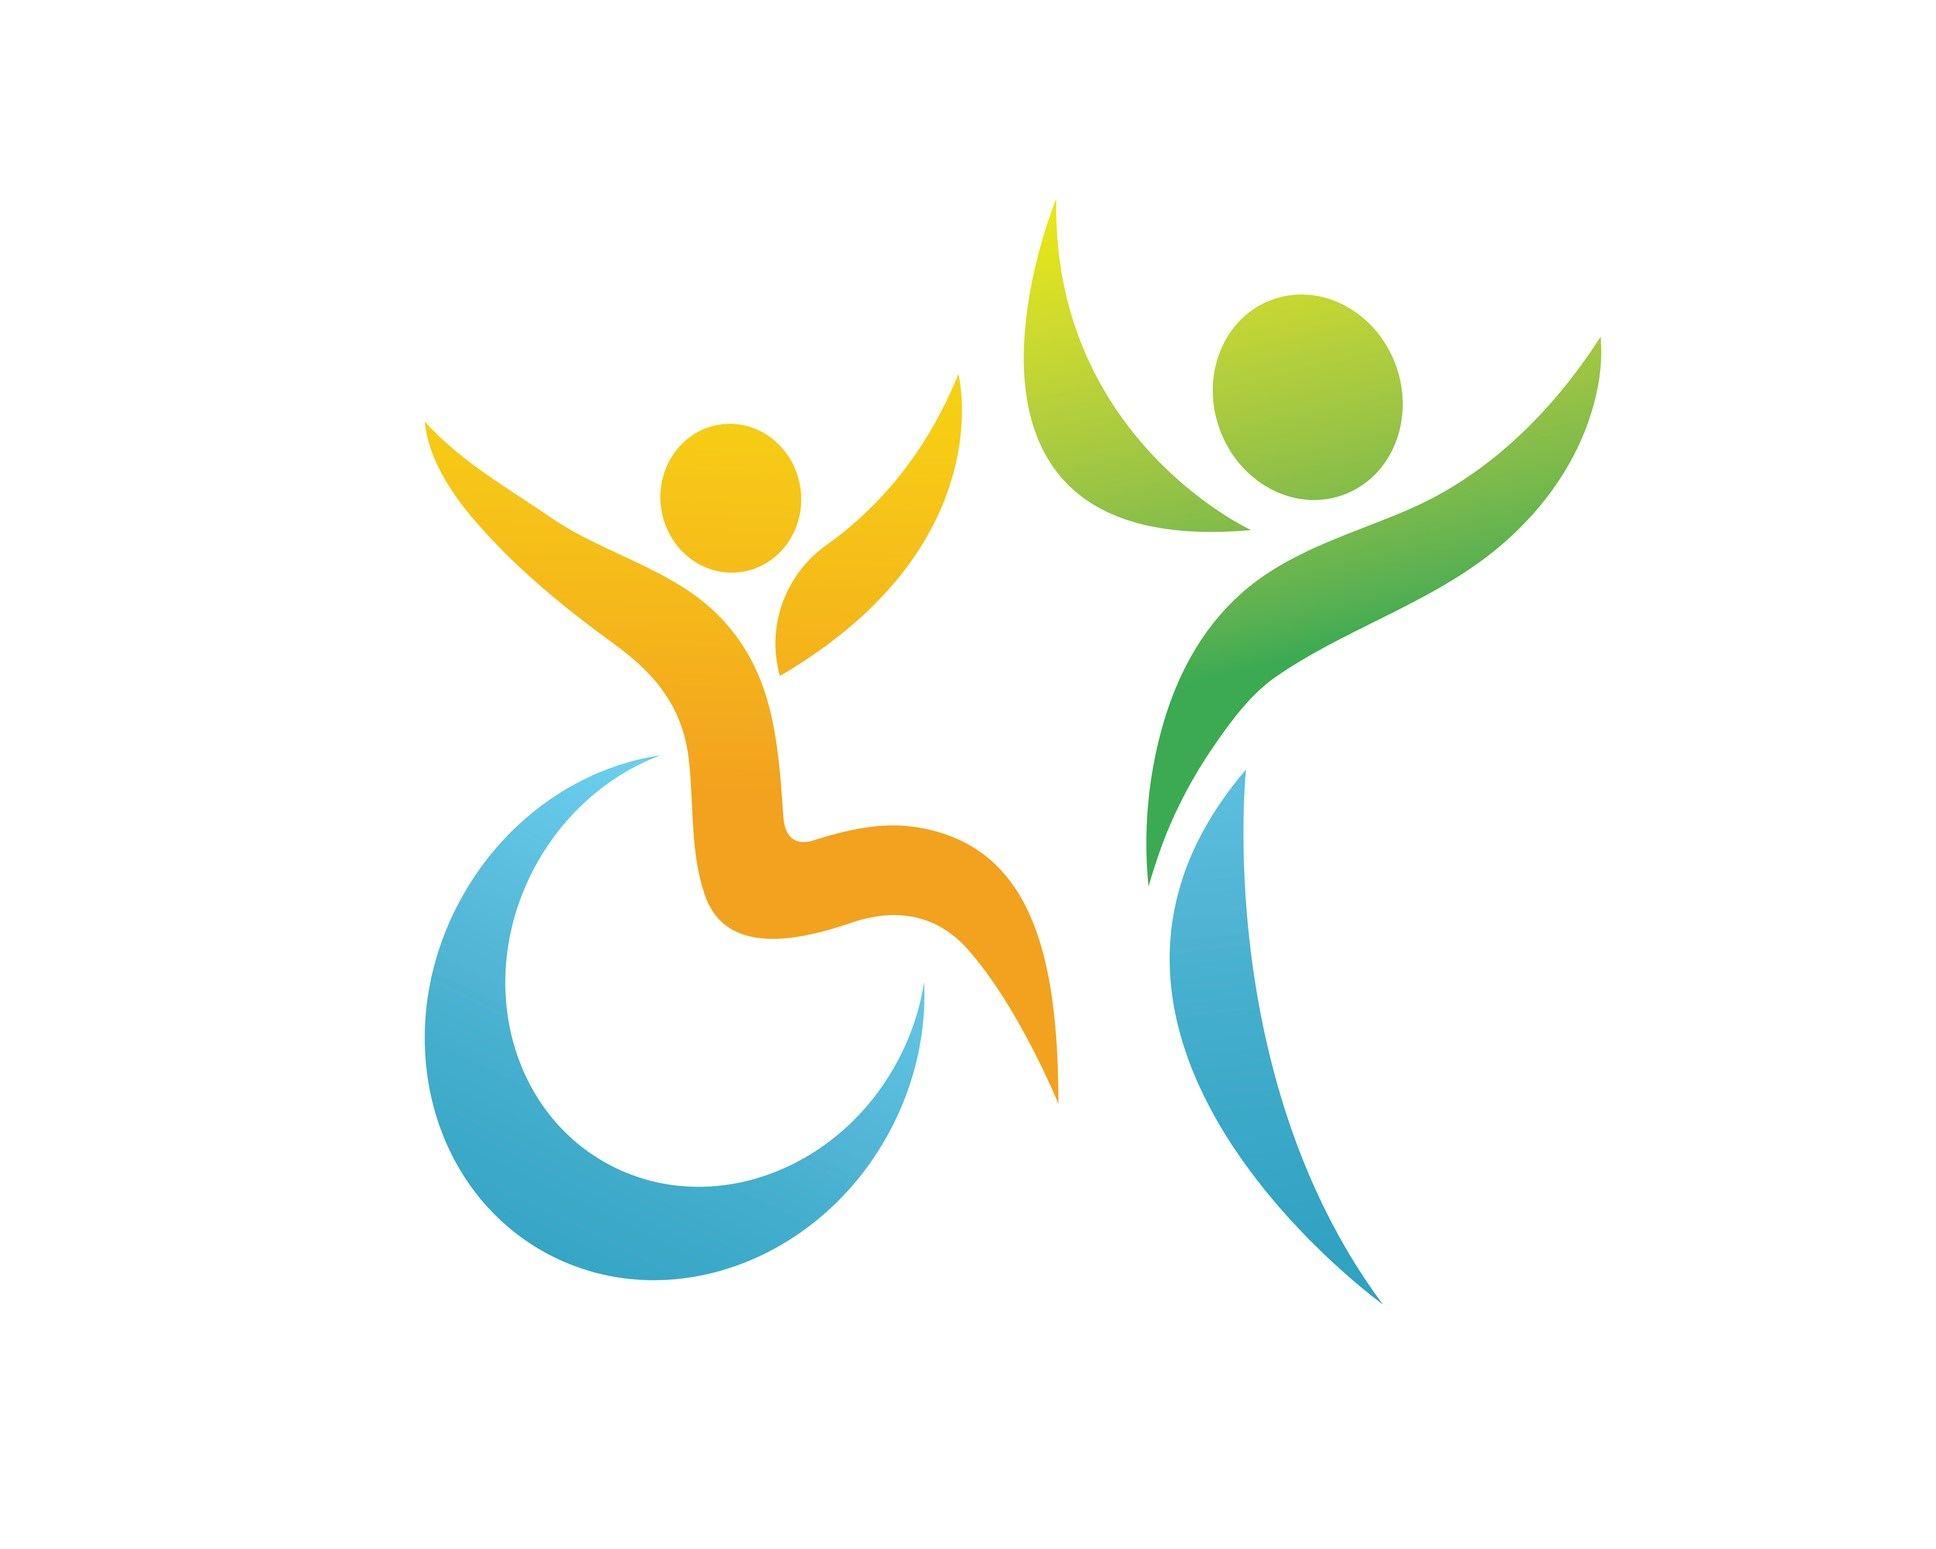 disability network logo uk Google Search Vector logo